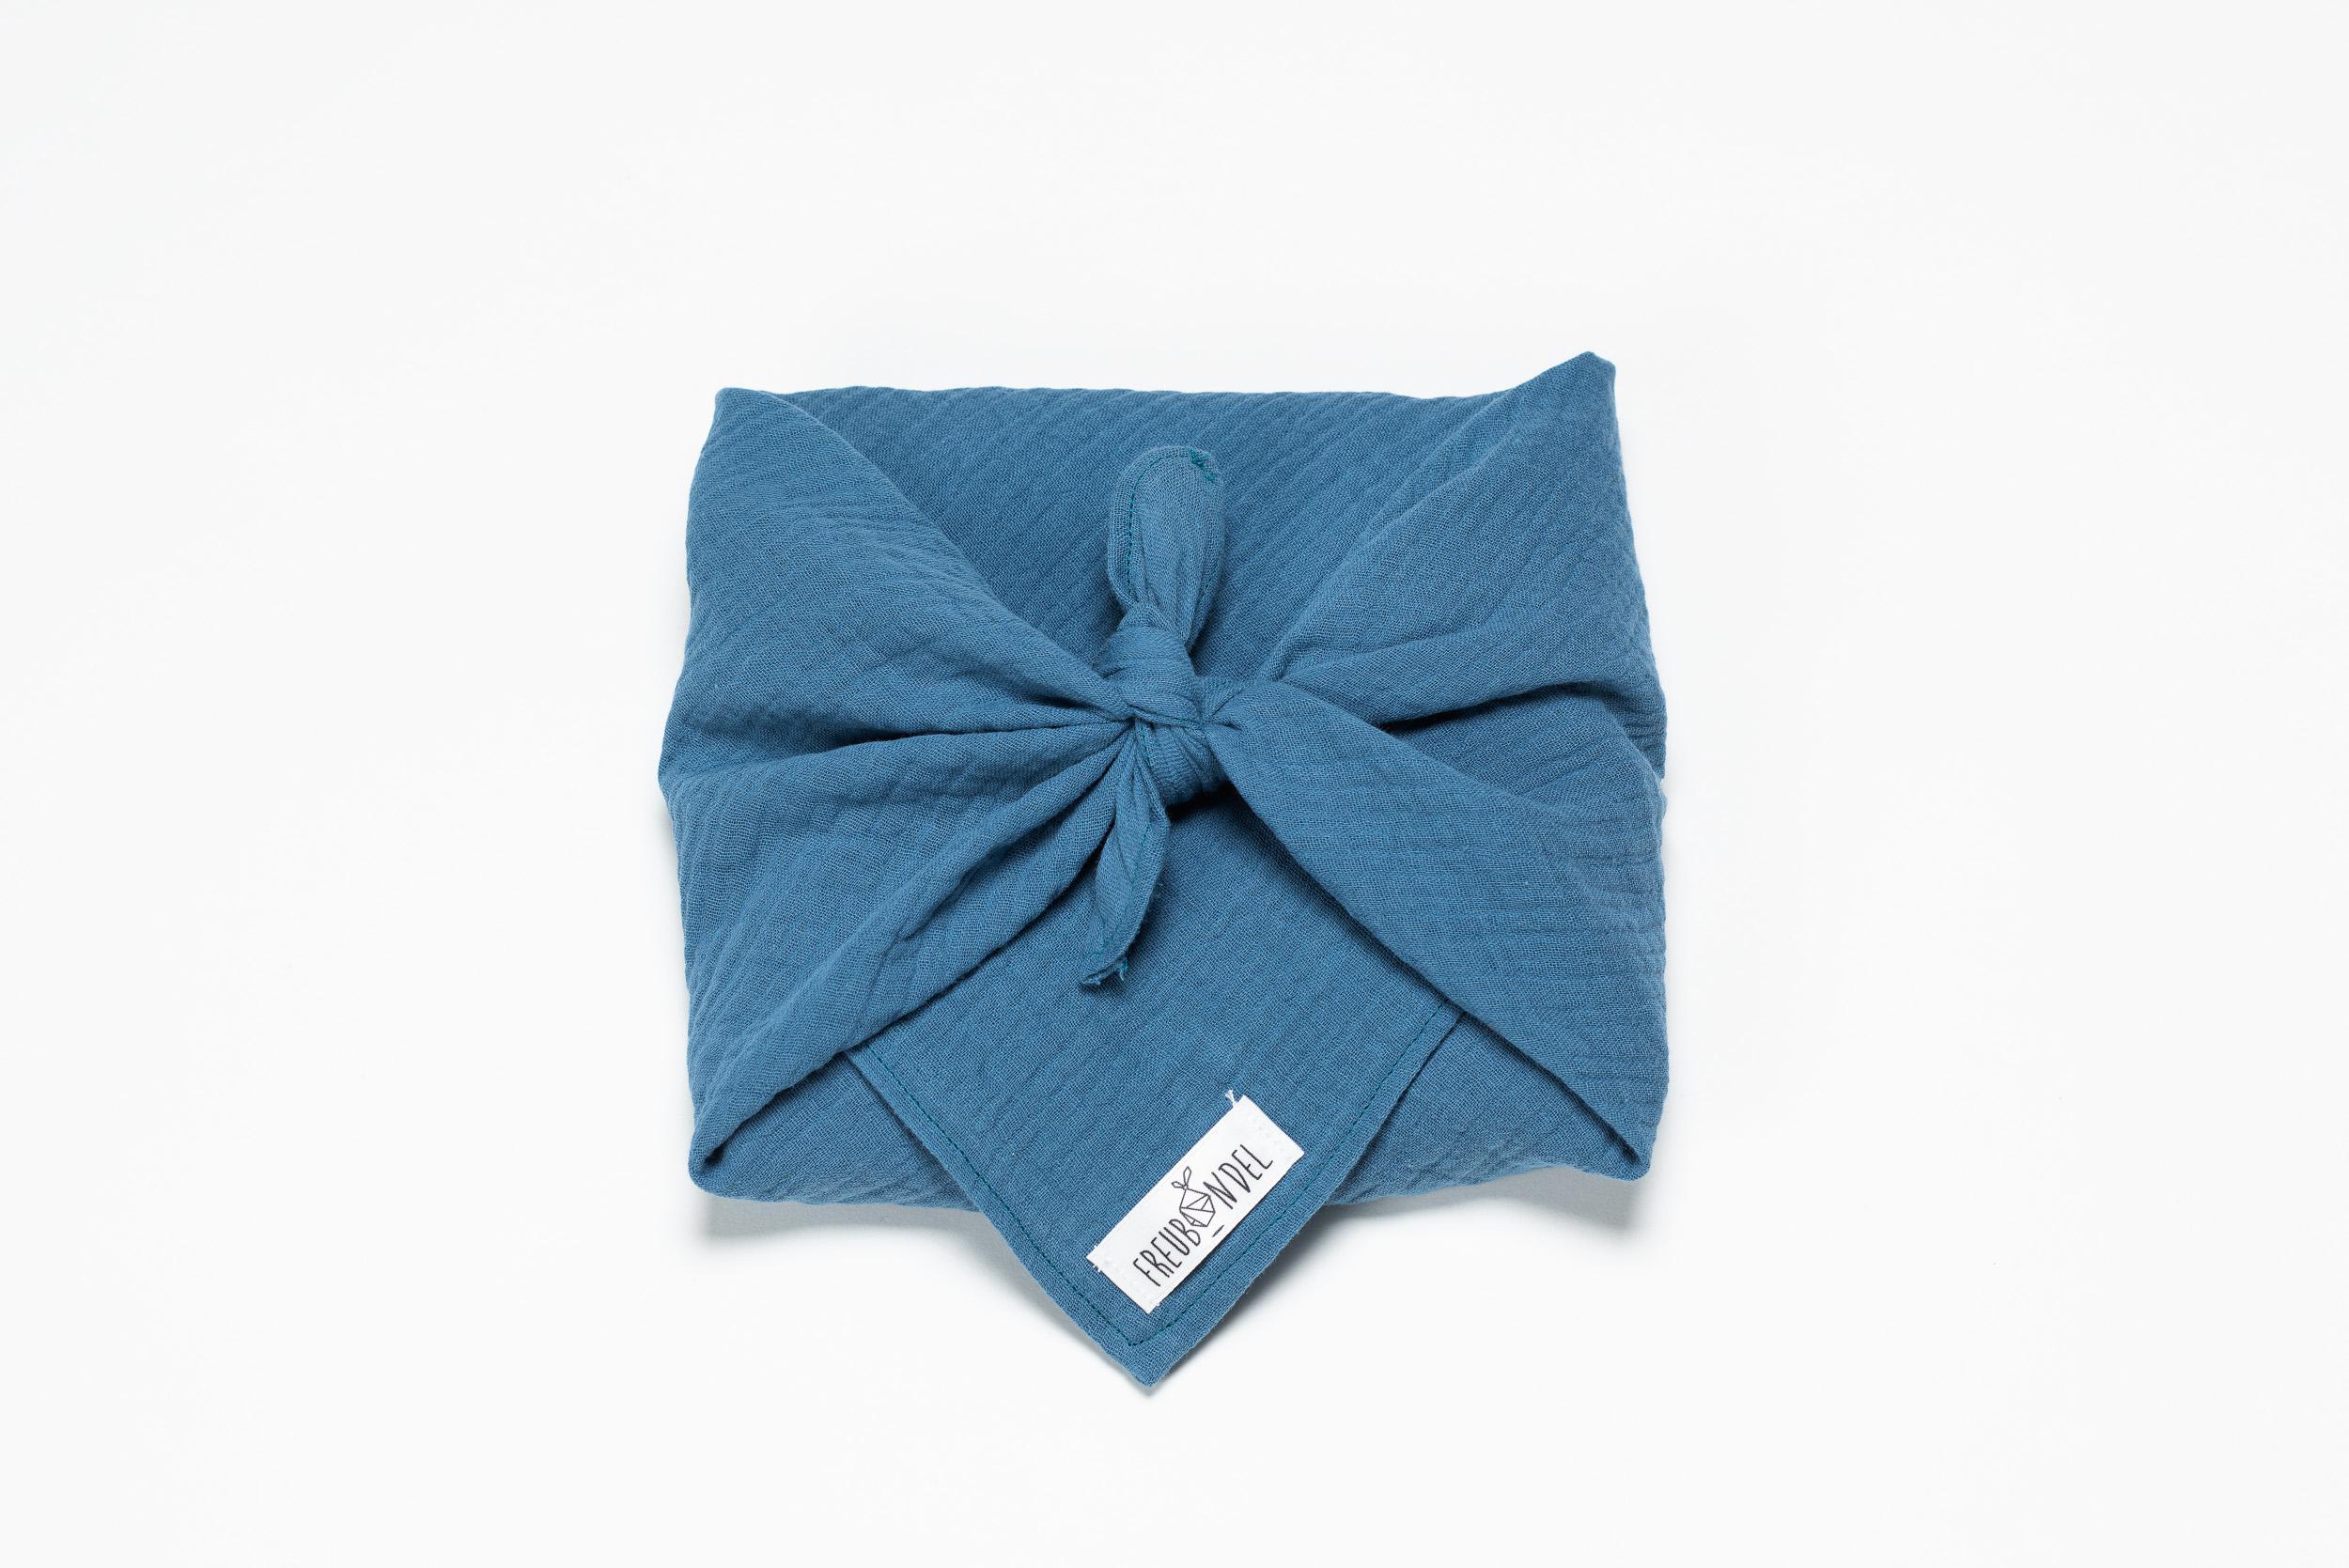 Freubündel-Tuch Musselin dunkelblau